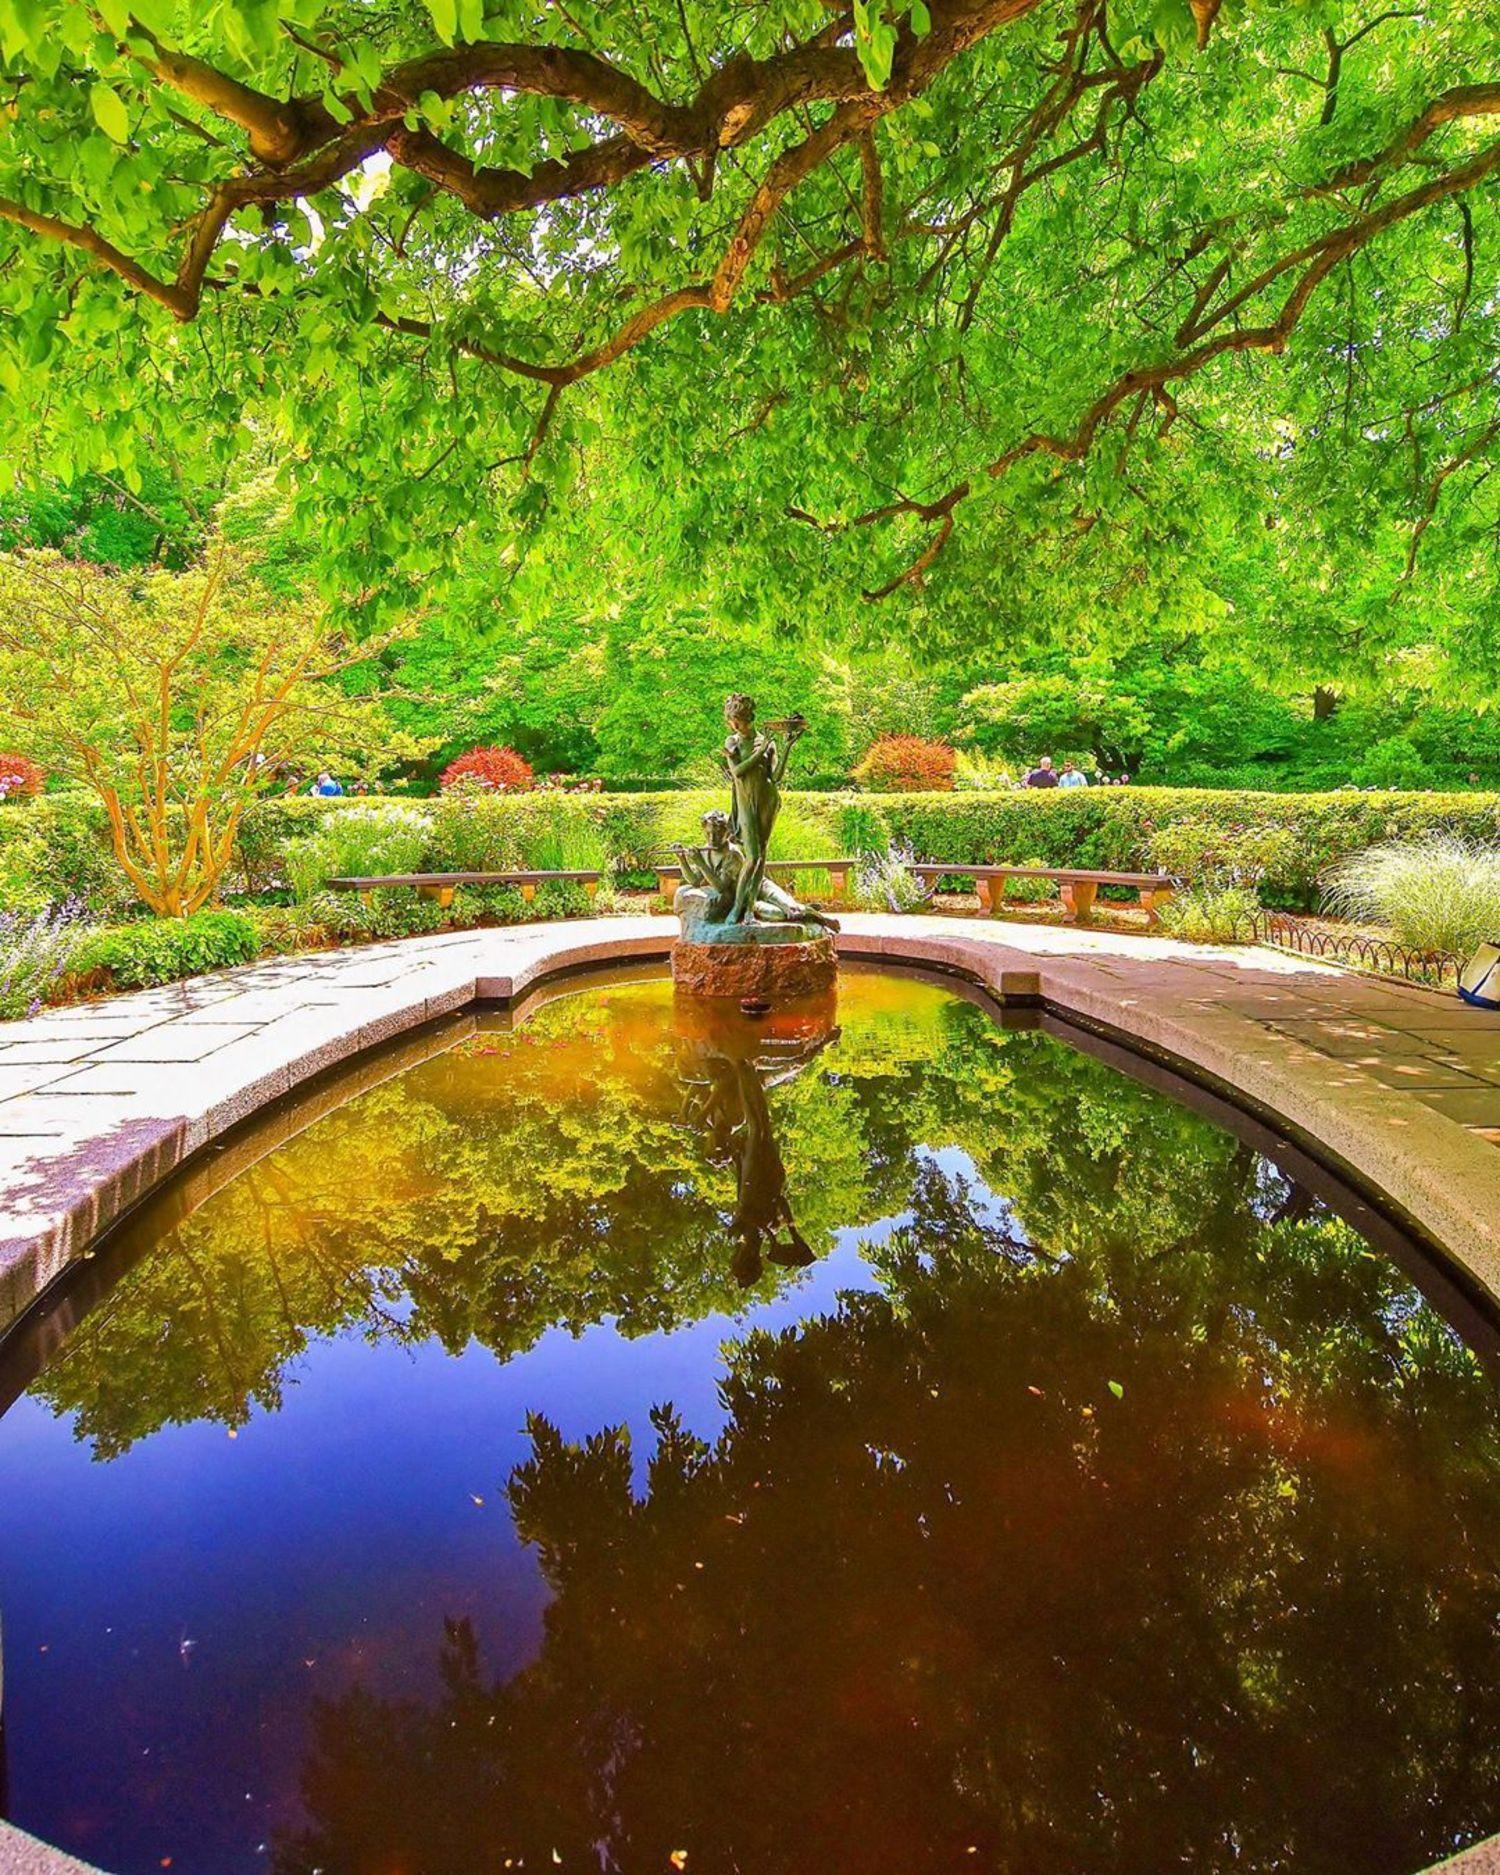 Conservatory Water and Garden, Central Park, Manhattan